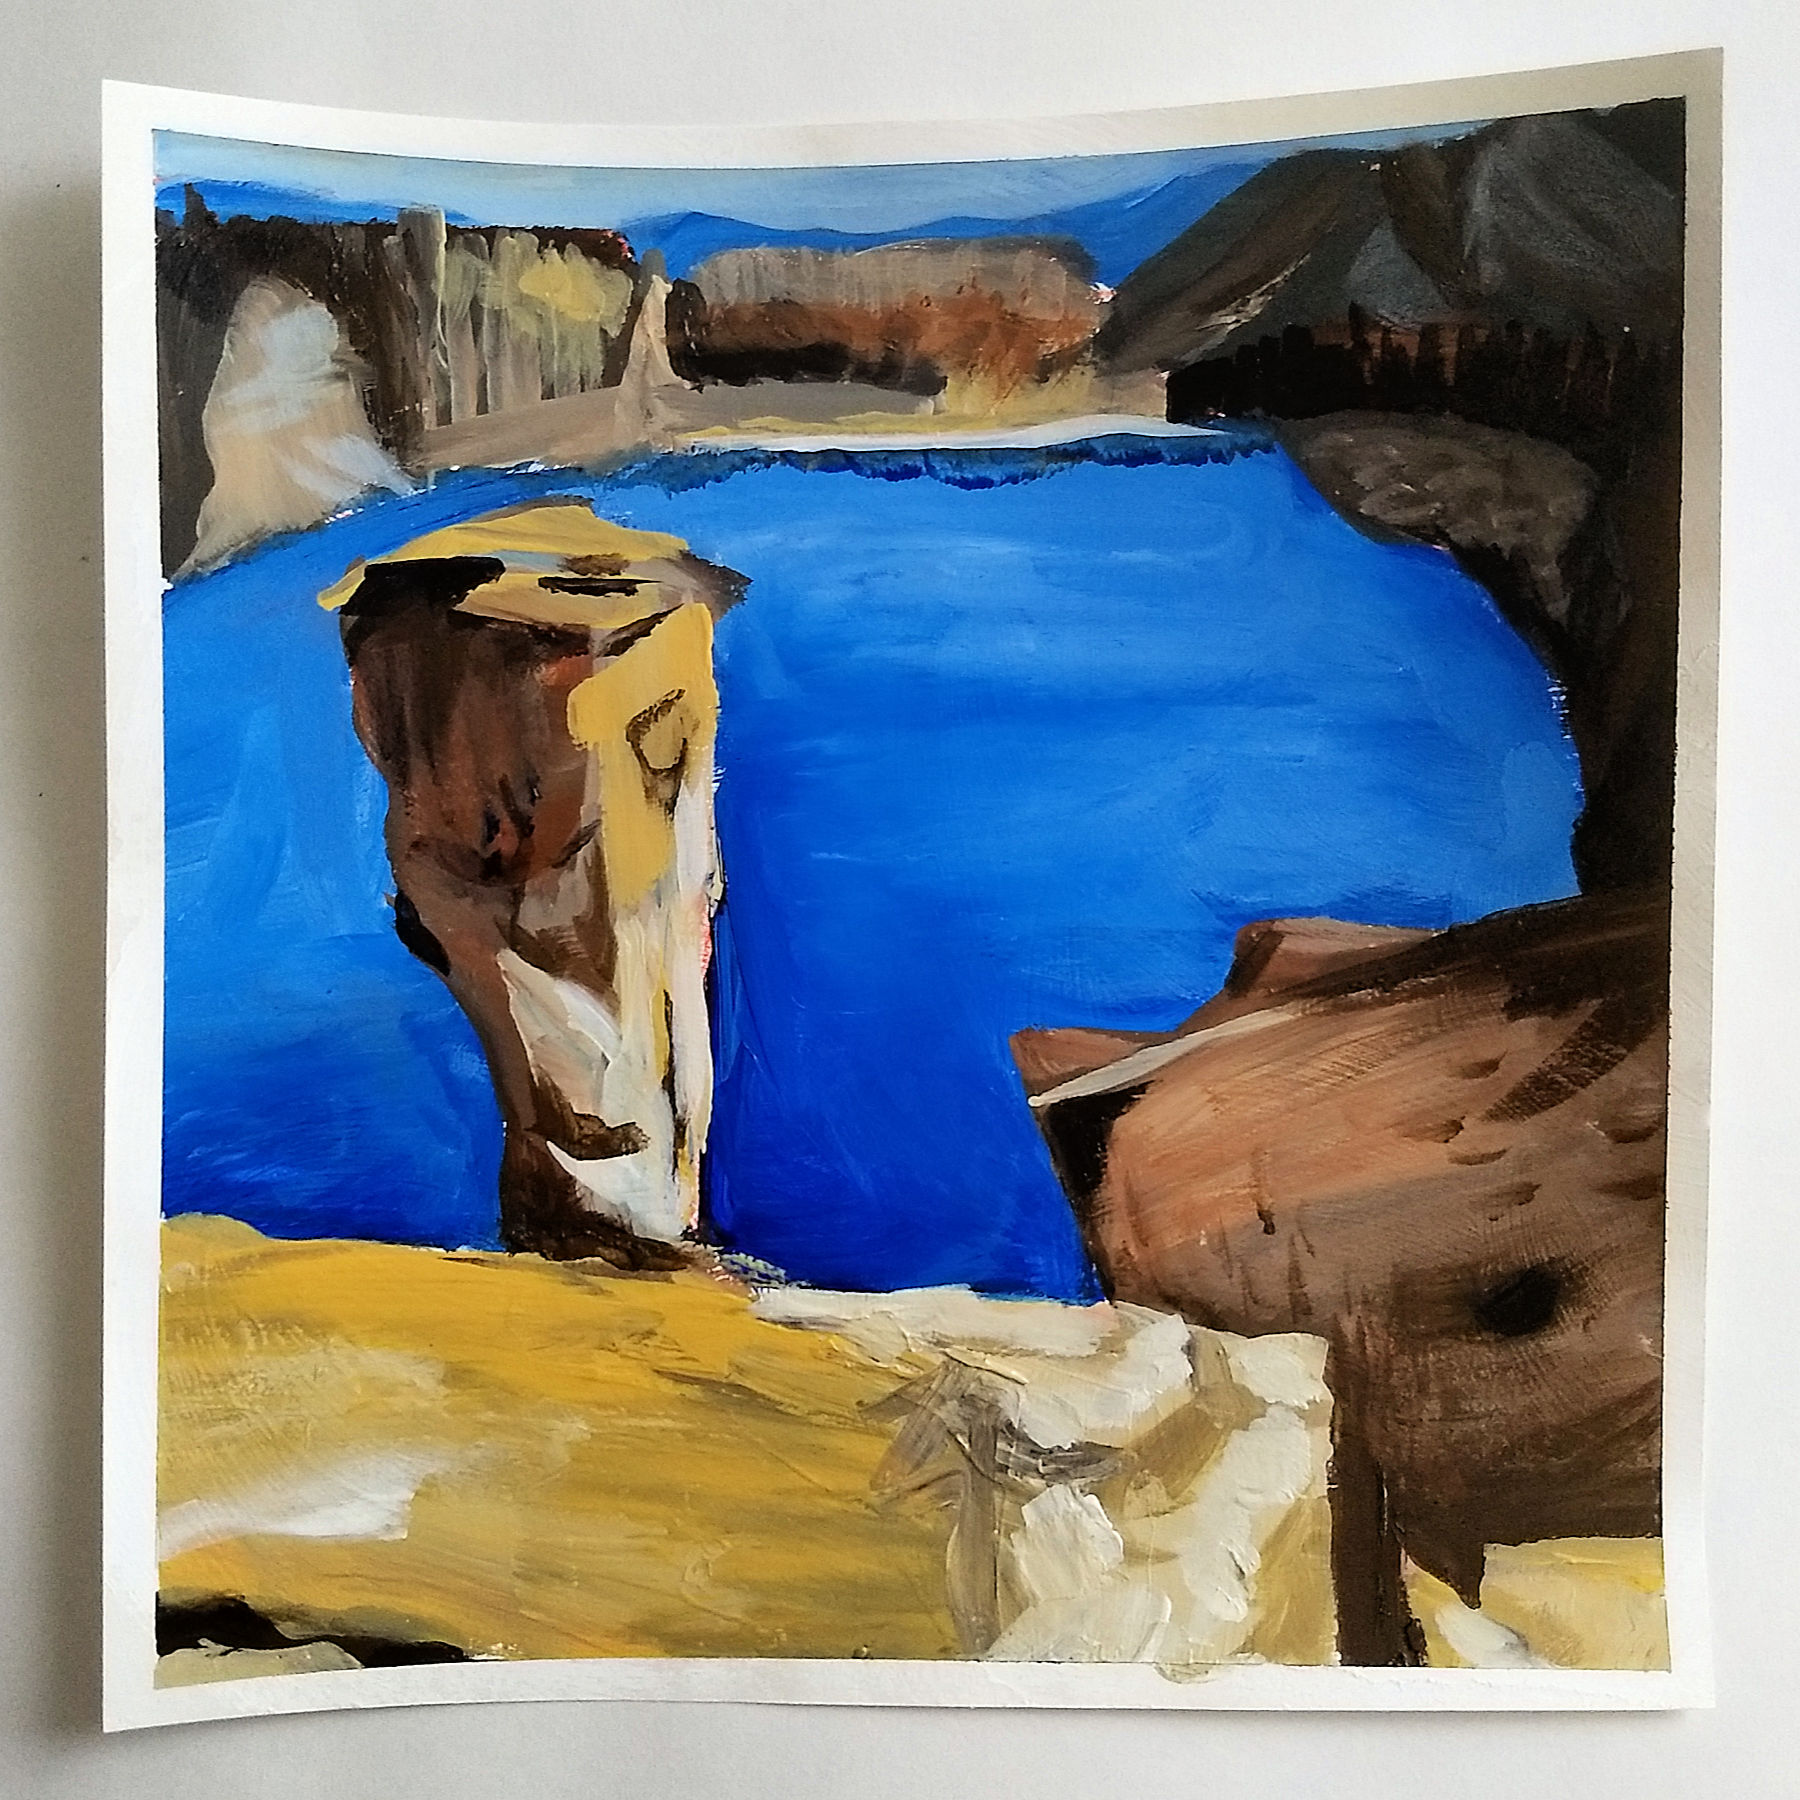 landscape sketch study, acrylic painting on paper, Hali Karla Arts